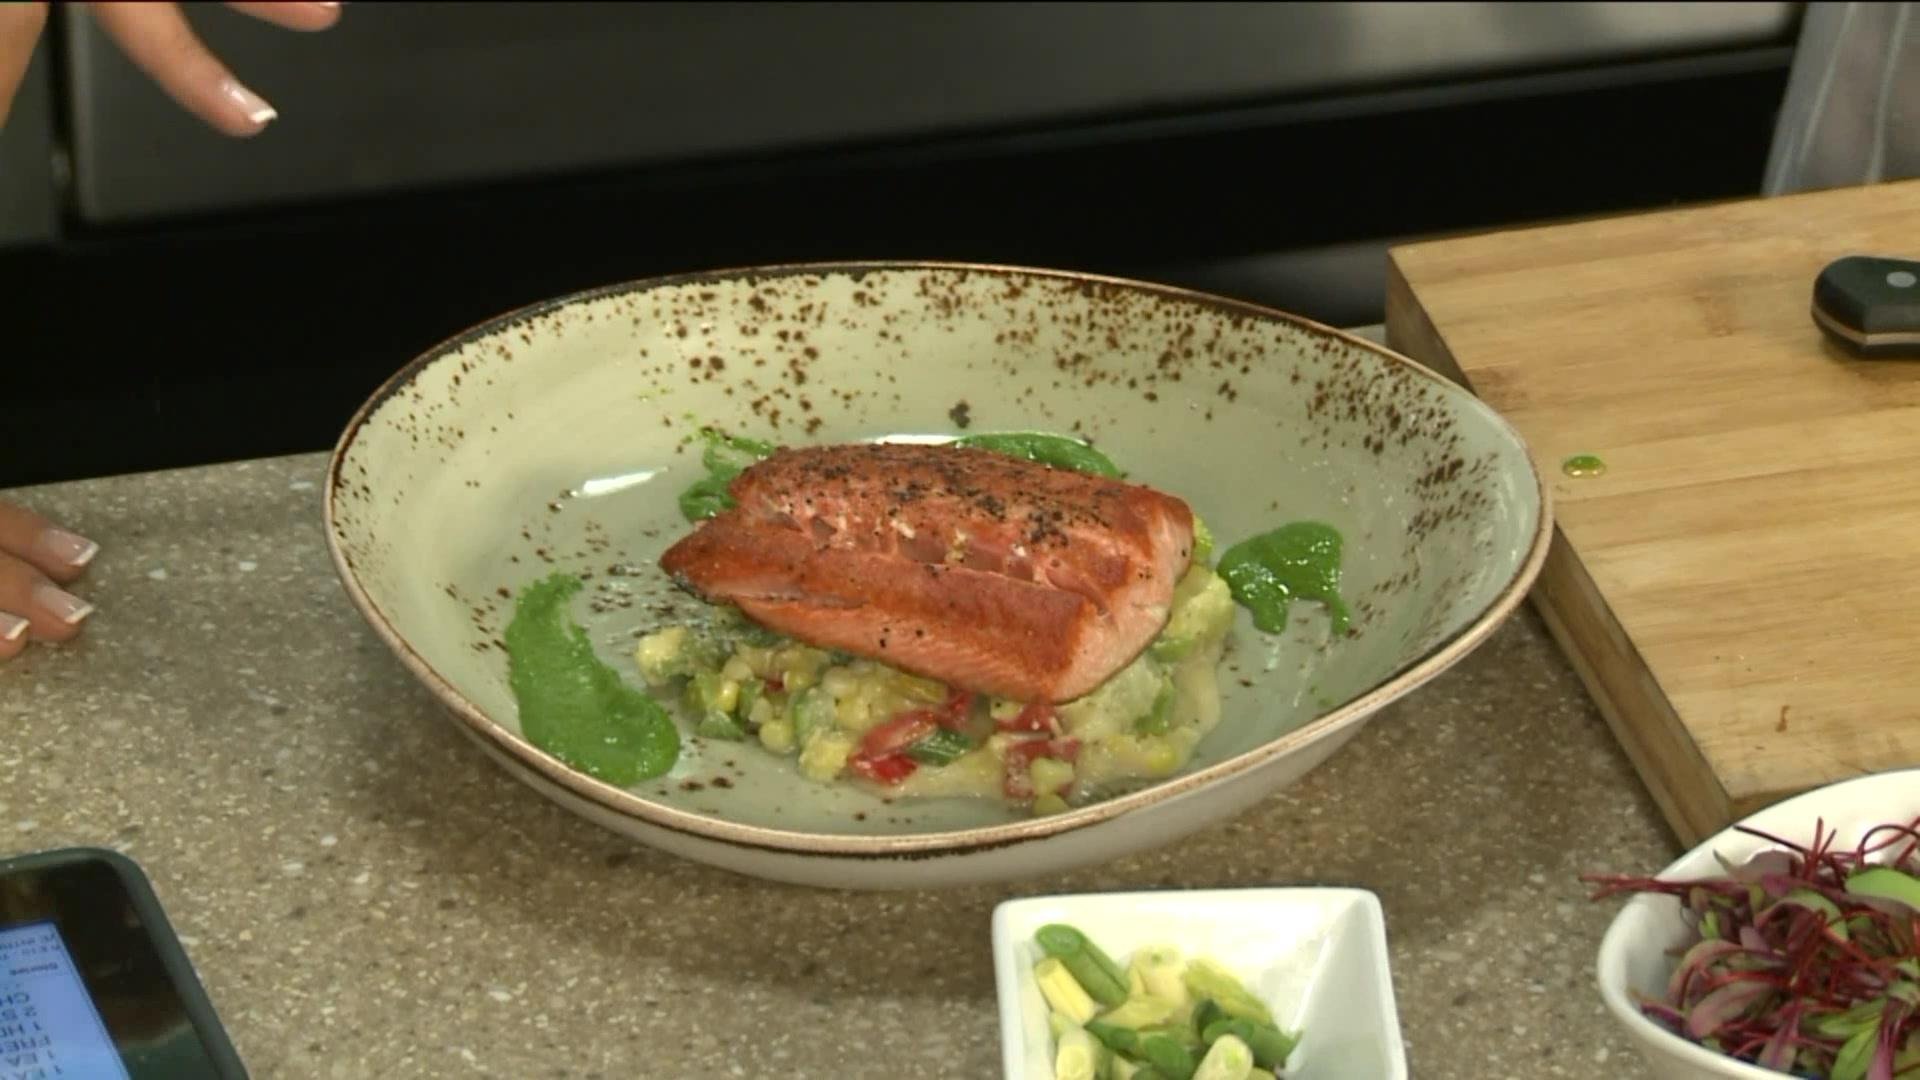 How To Make A Delicious Salmon Succotash